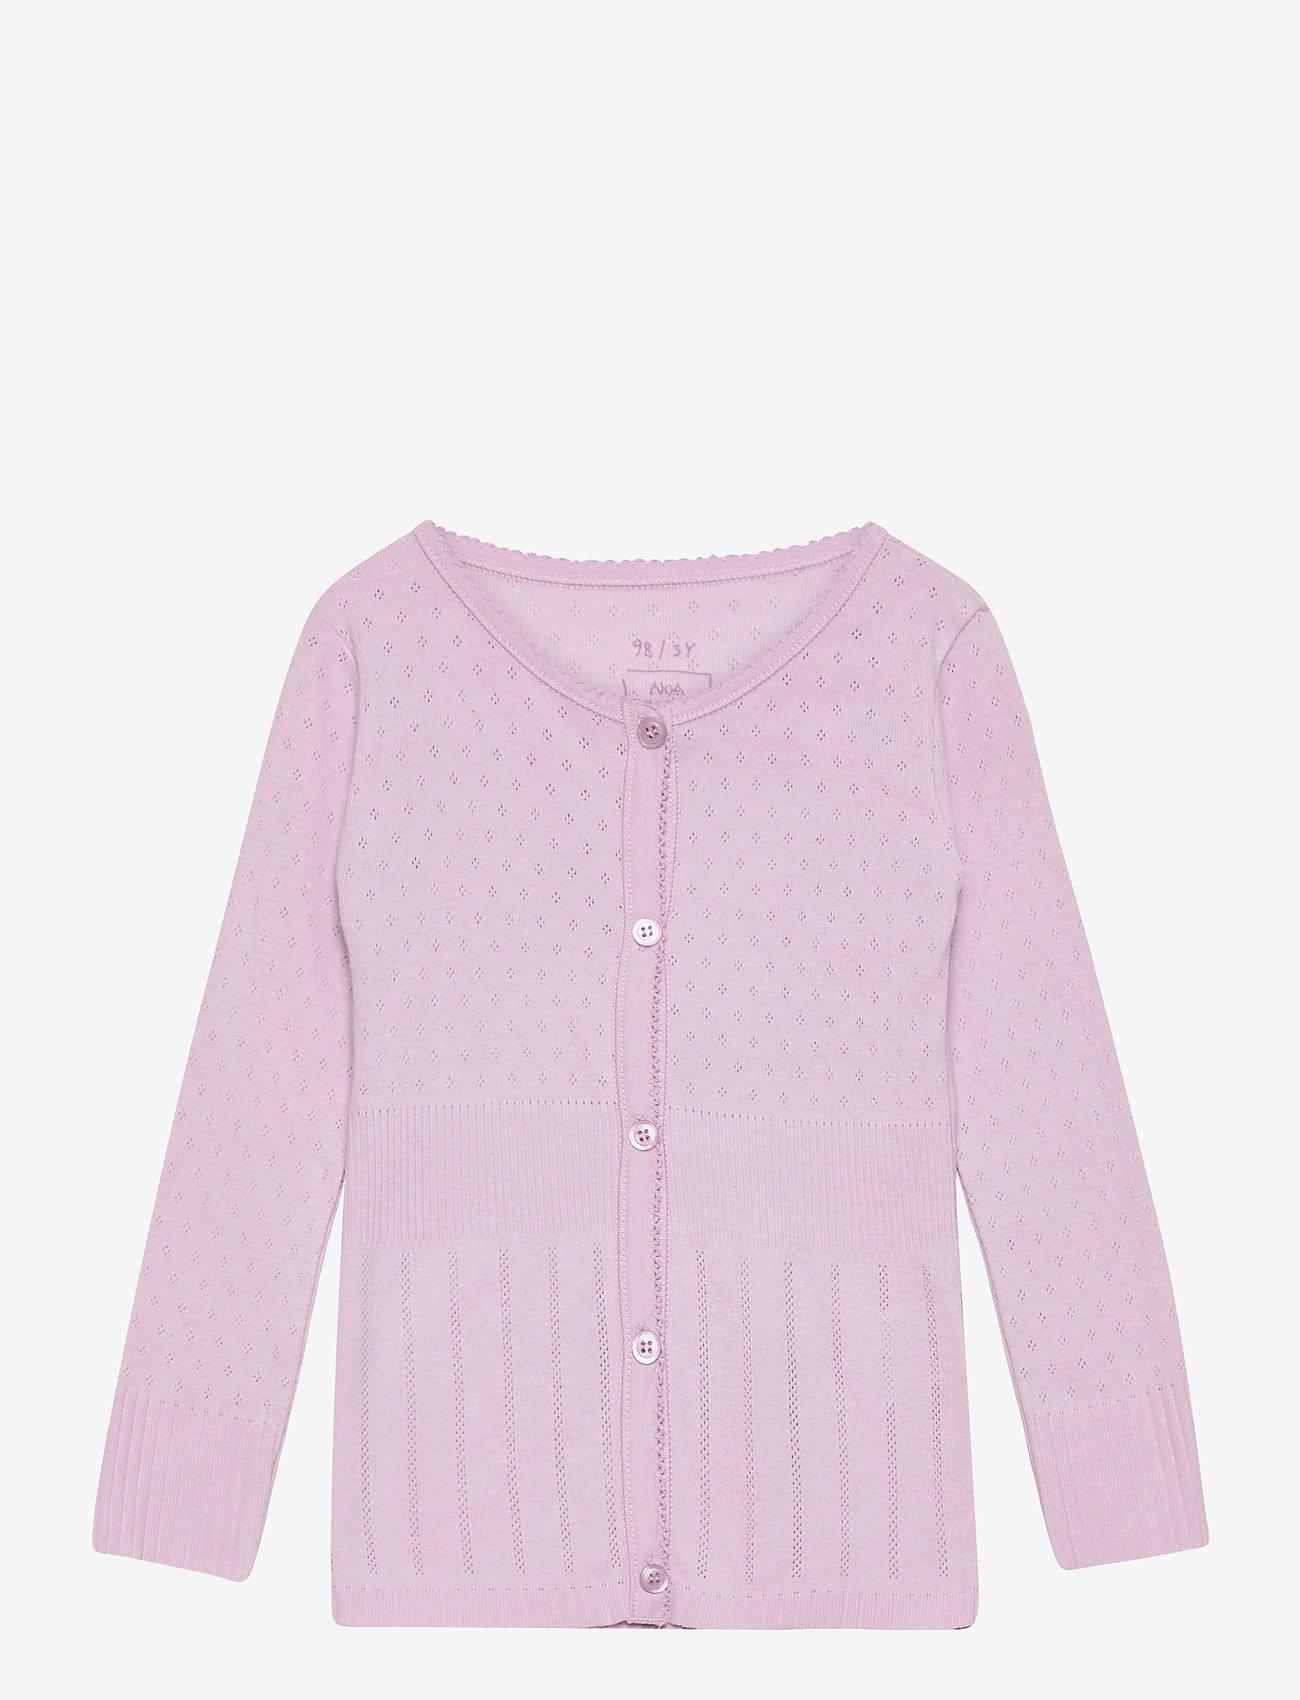 Noa Noa Miniature - Cardigan - gilets - lavender frost - 0